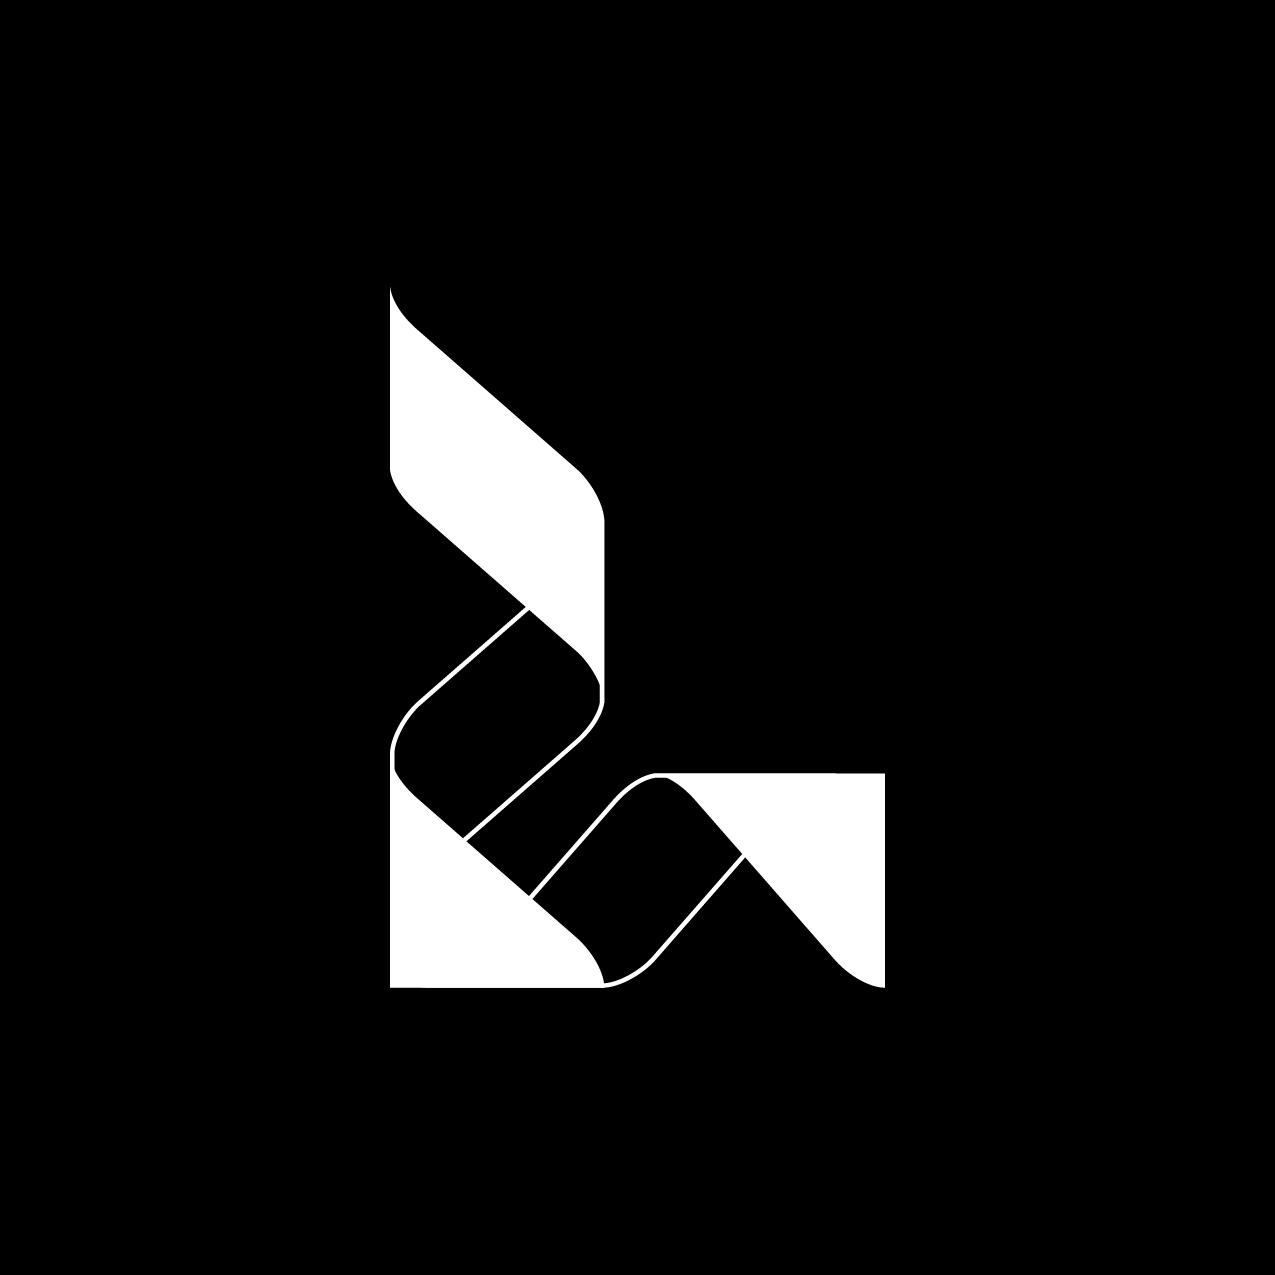 Letter L3 Design by Furia